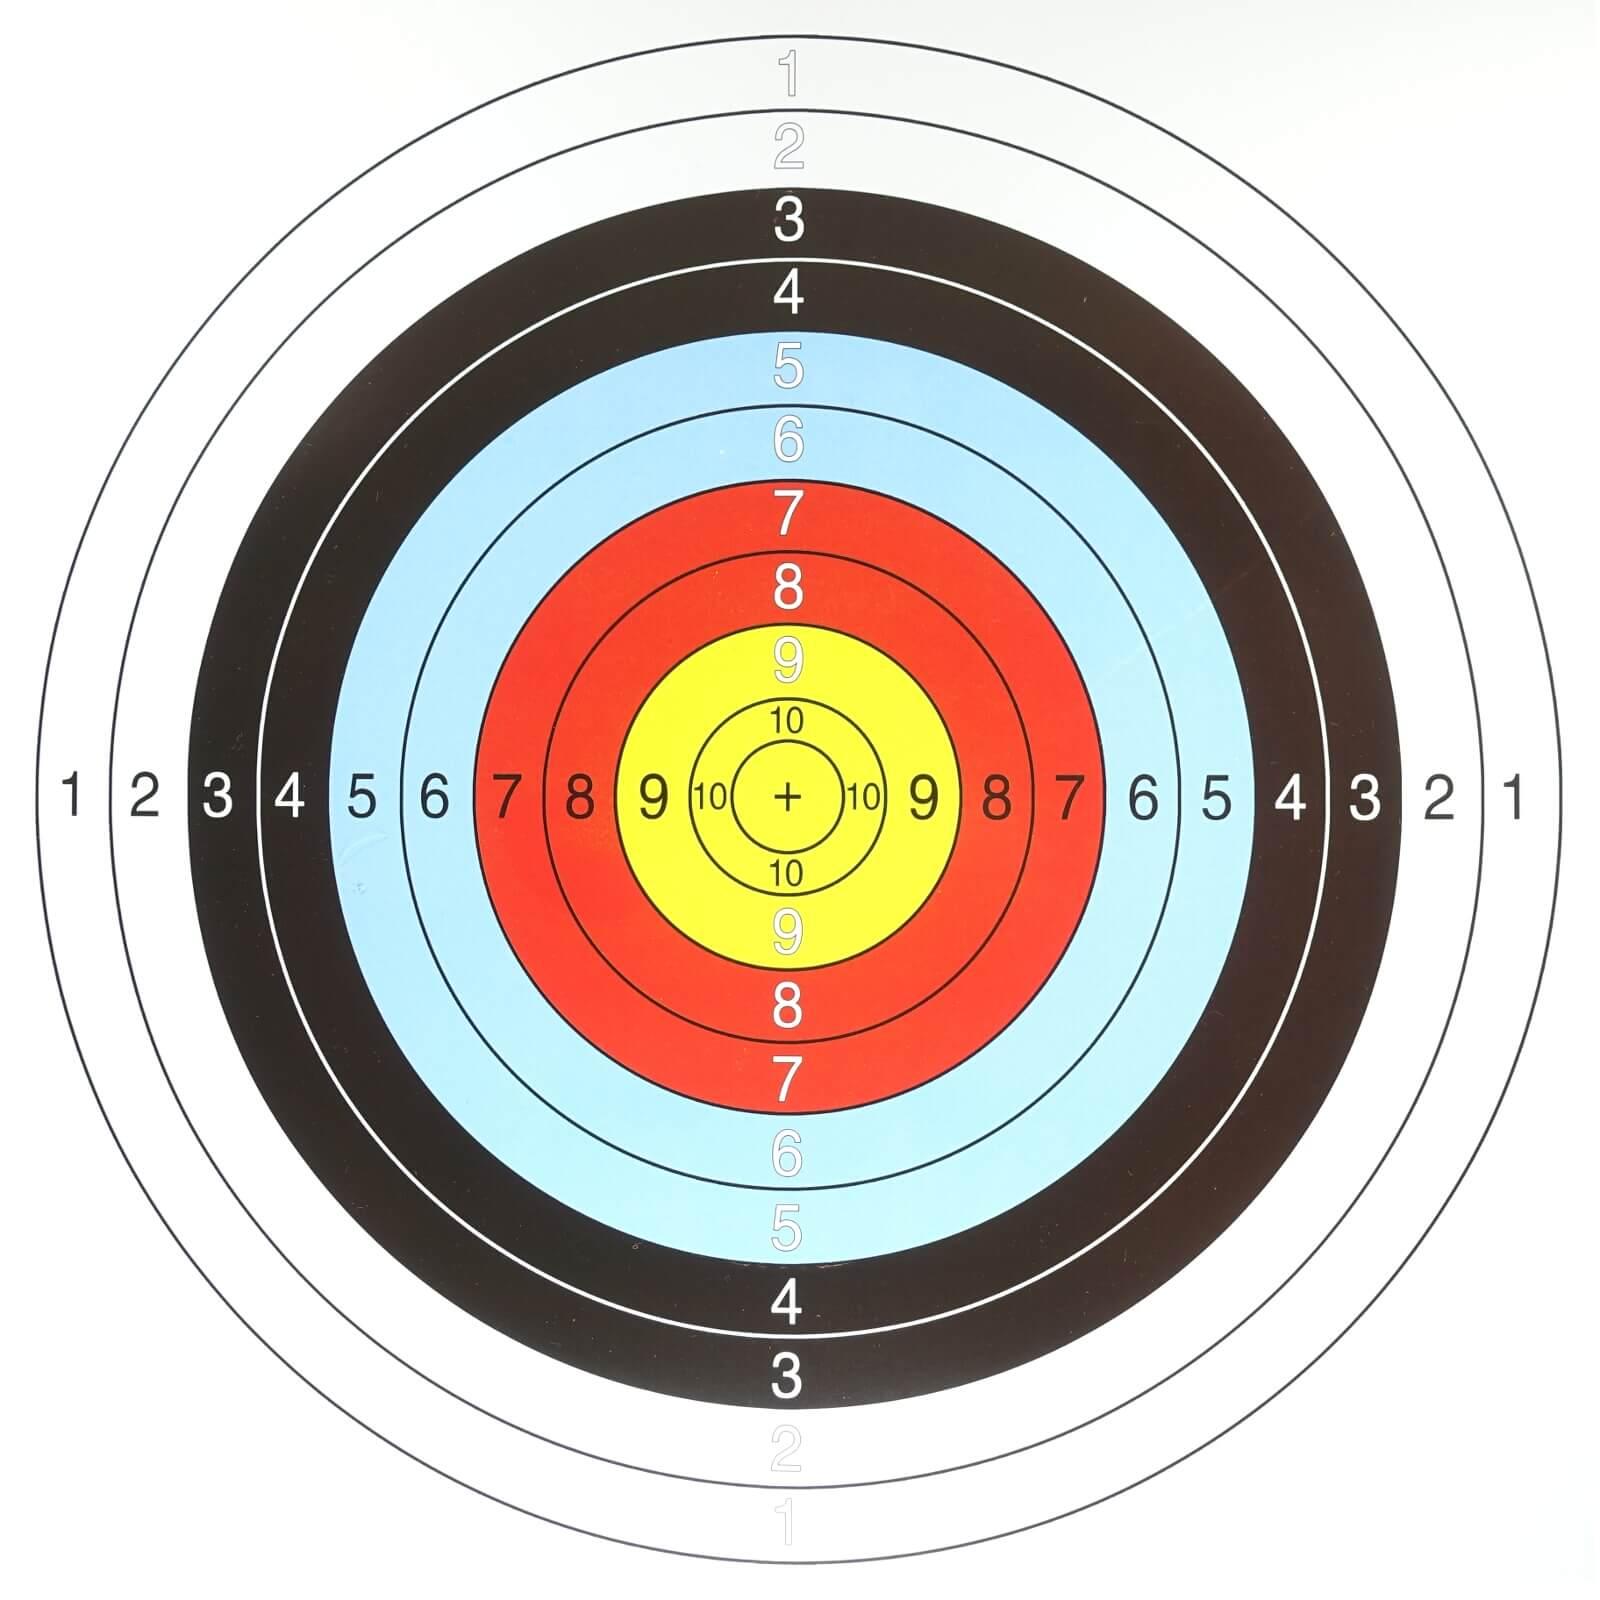 Archery Arrow Target Sheet 10 Rings 12 Counts 40 Cm